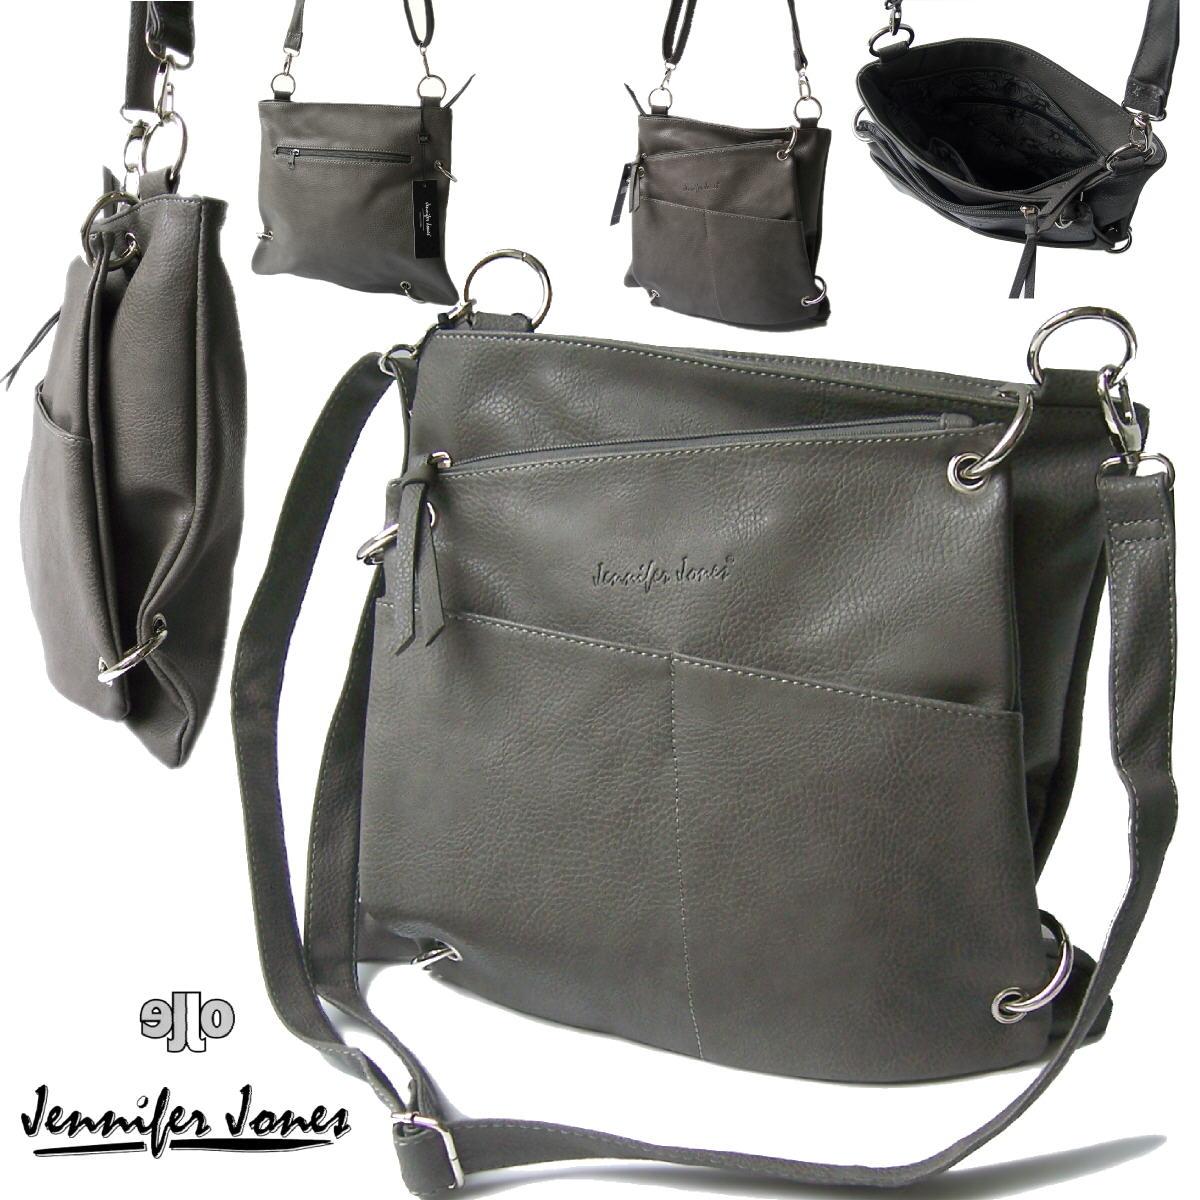 Tasche Handtasche 2in1 Schultertasche Jennifer Jones grau Damen Ta7024